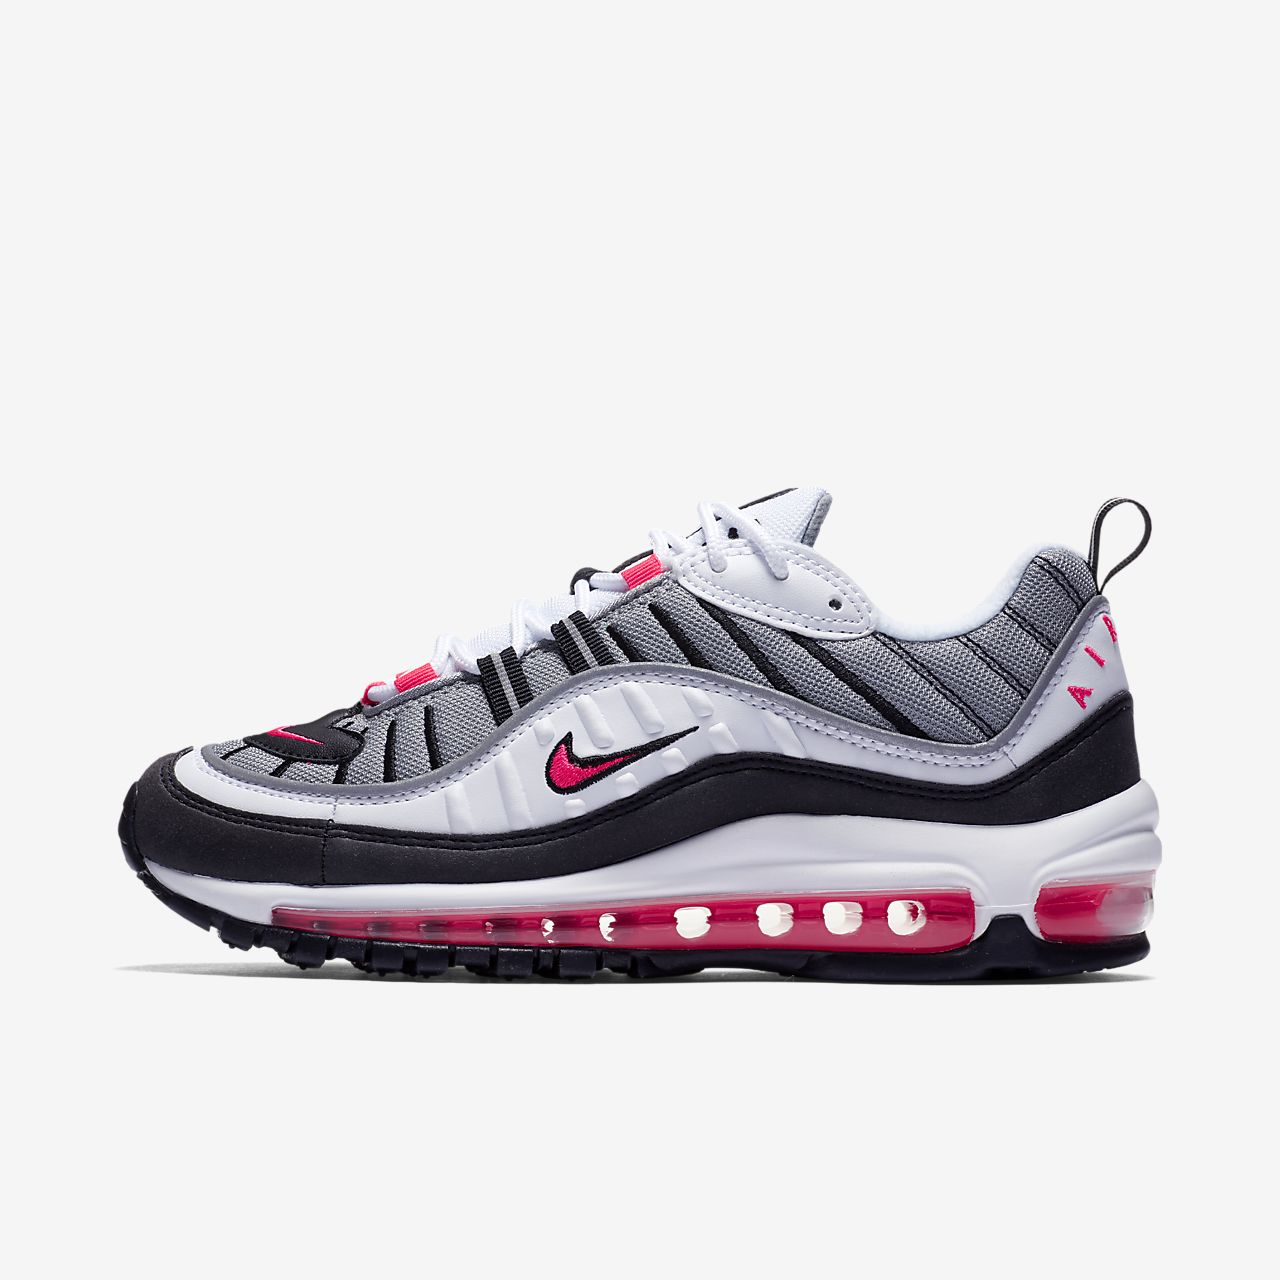 Nike Air Max 95 Shoelaces